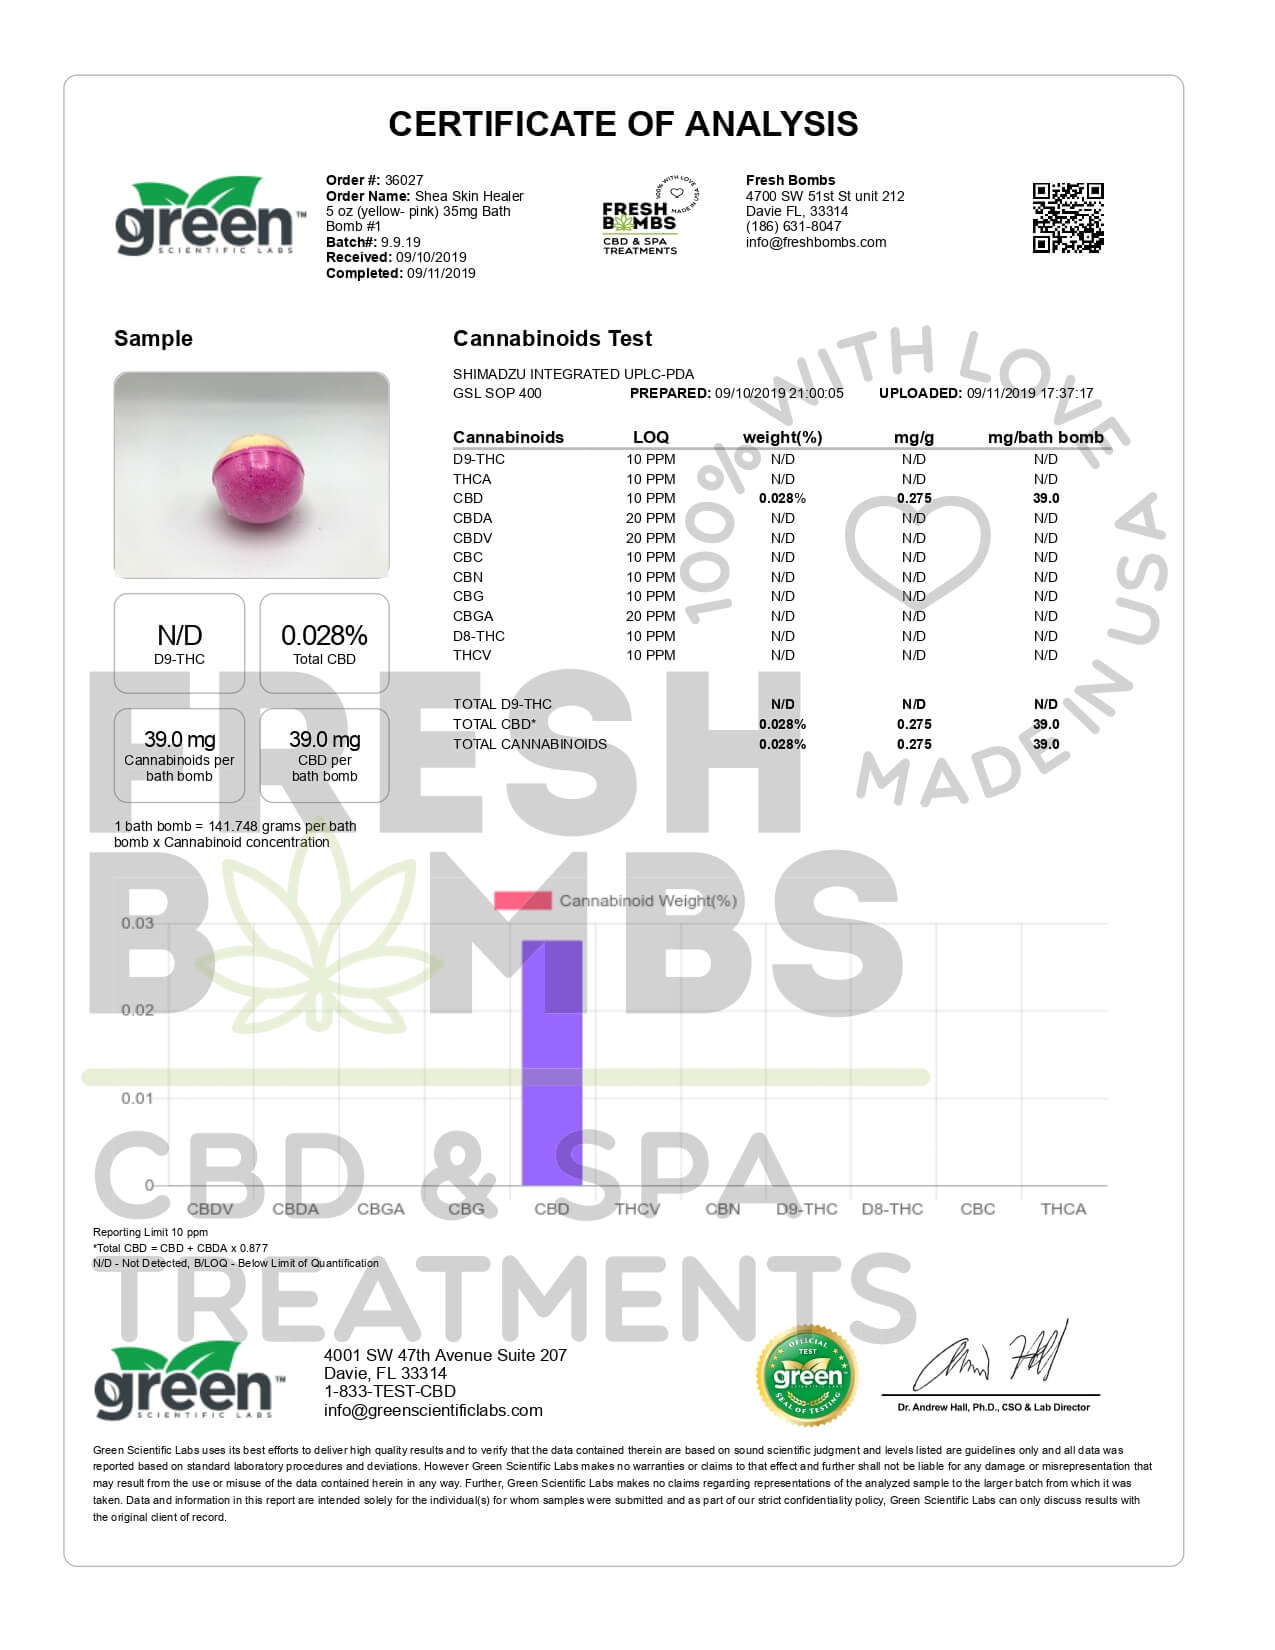 Fresh Bombs CBD Bath Shea Skin Healer Bath Bomb 5oz 35mg Lab Report